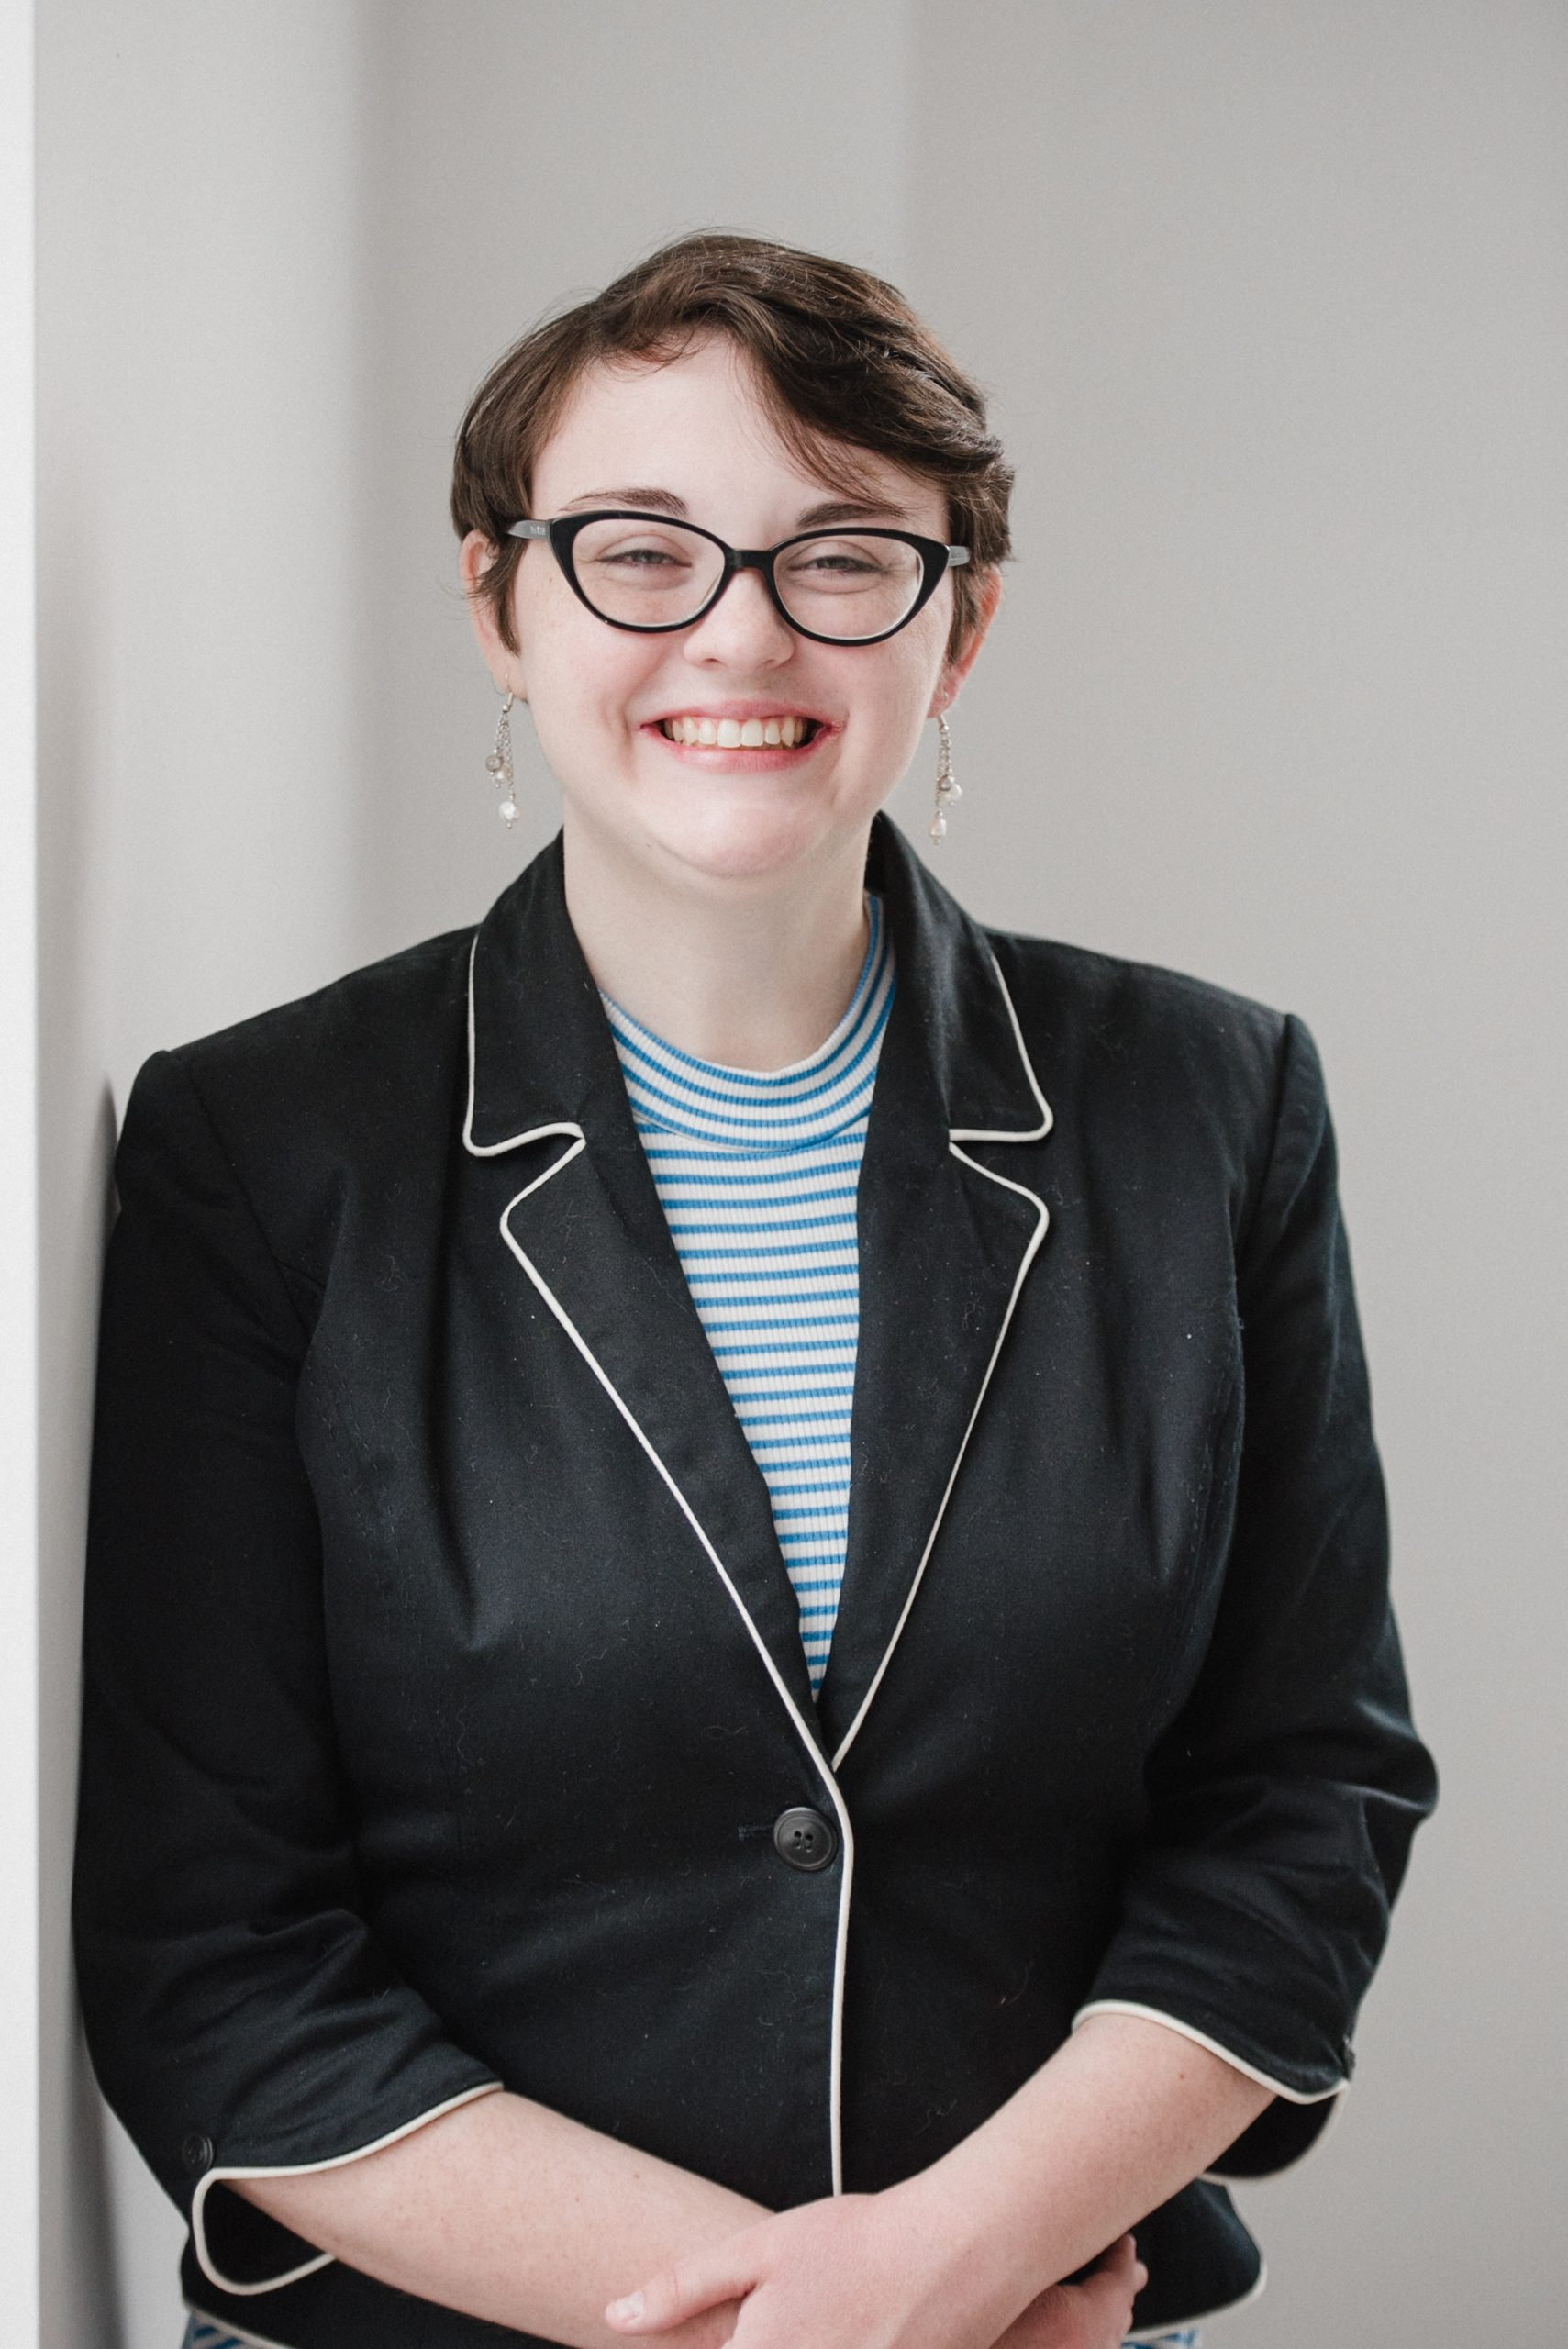 Molly MacMillan